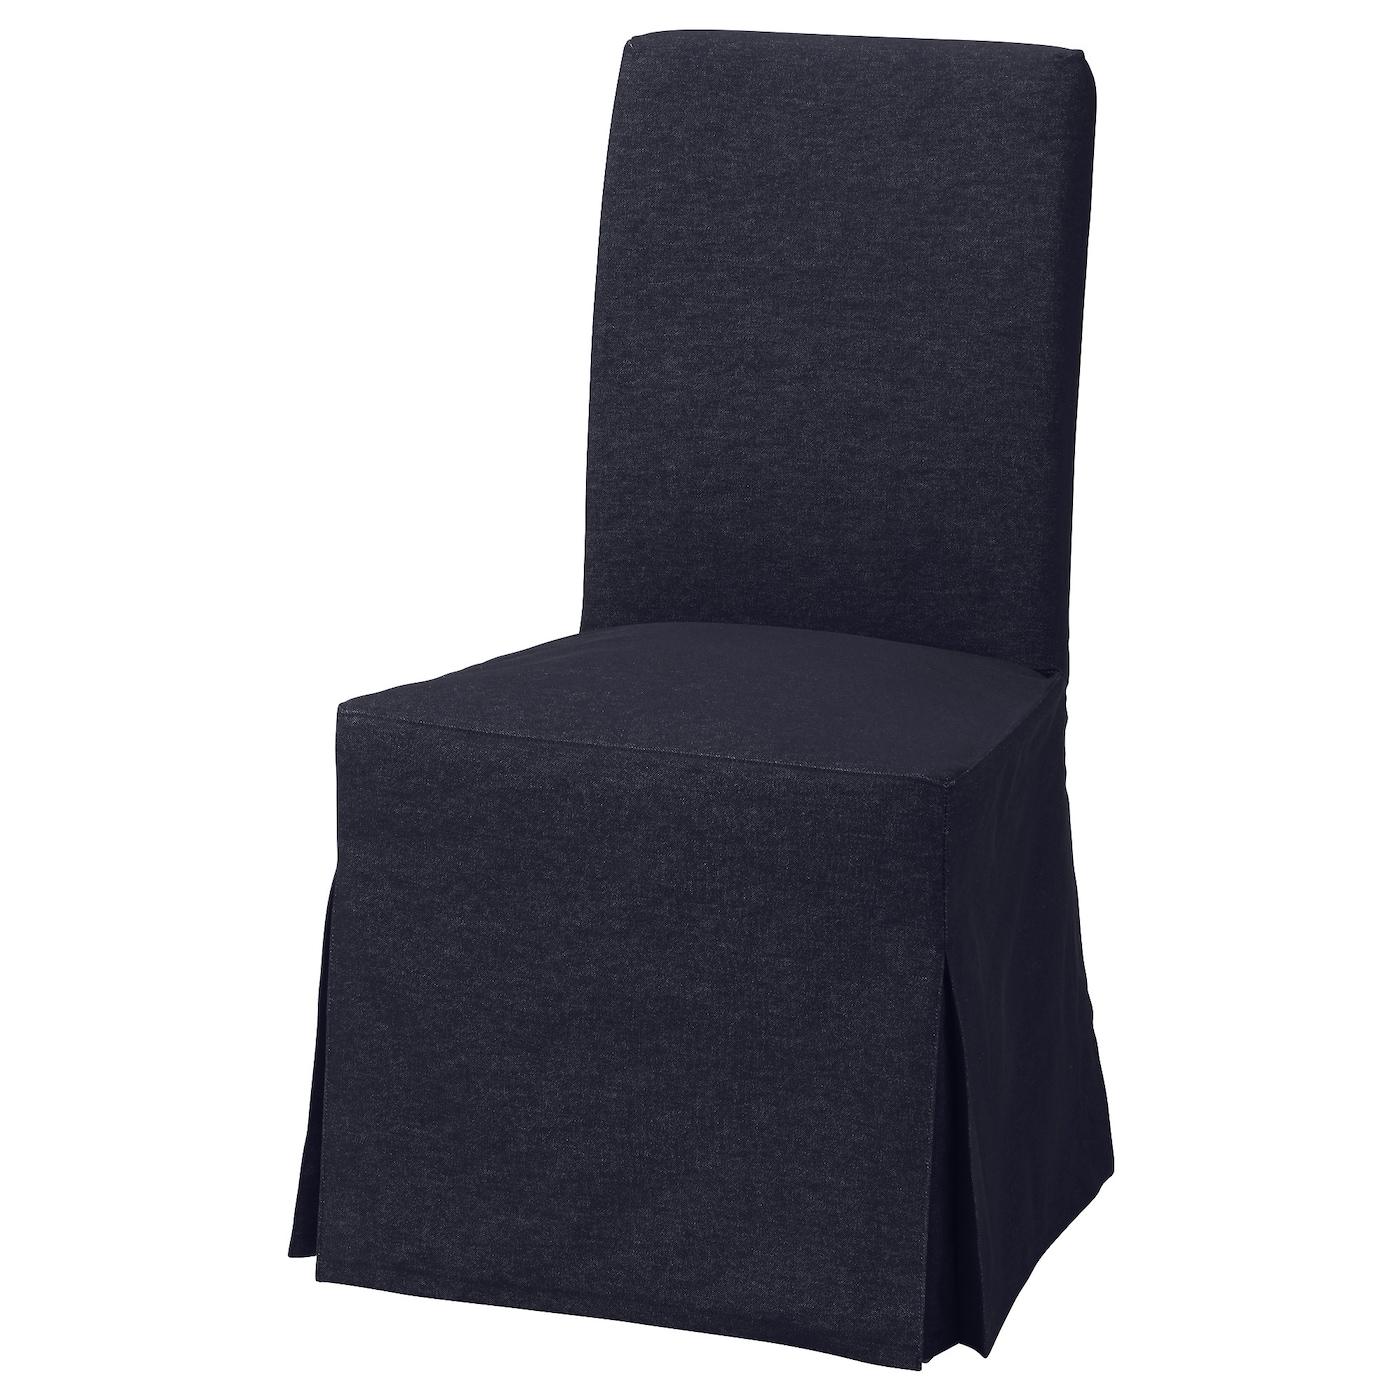 HENRIKSDAL, Stuhl mit langem Bezug, braunschwarz, dunkelblau 592.519.54